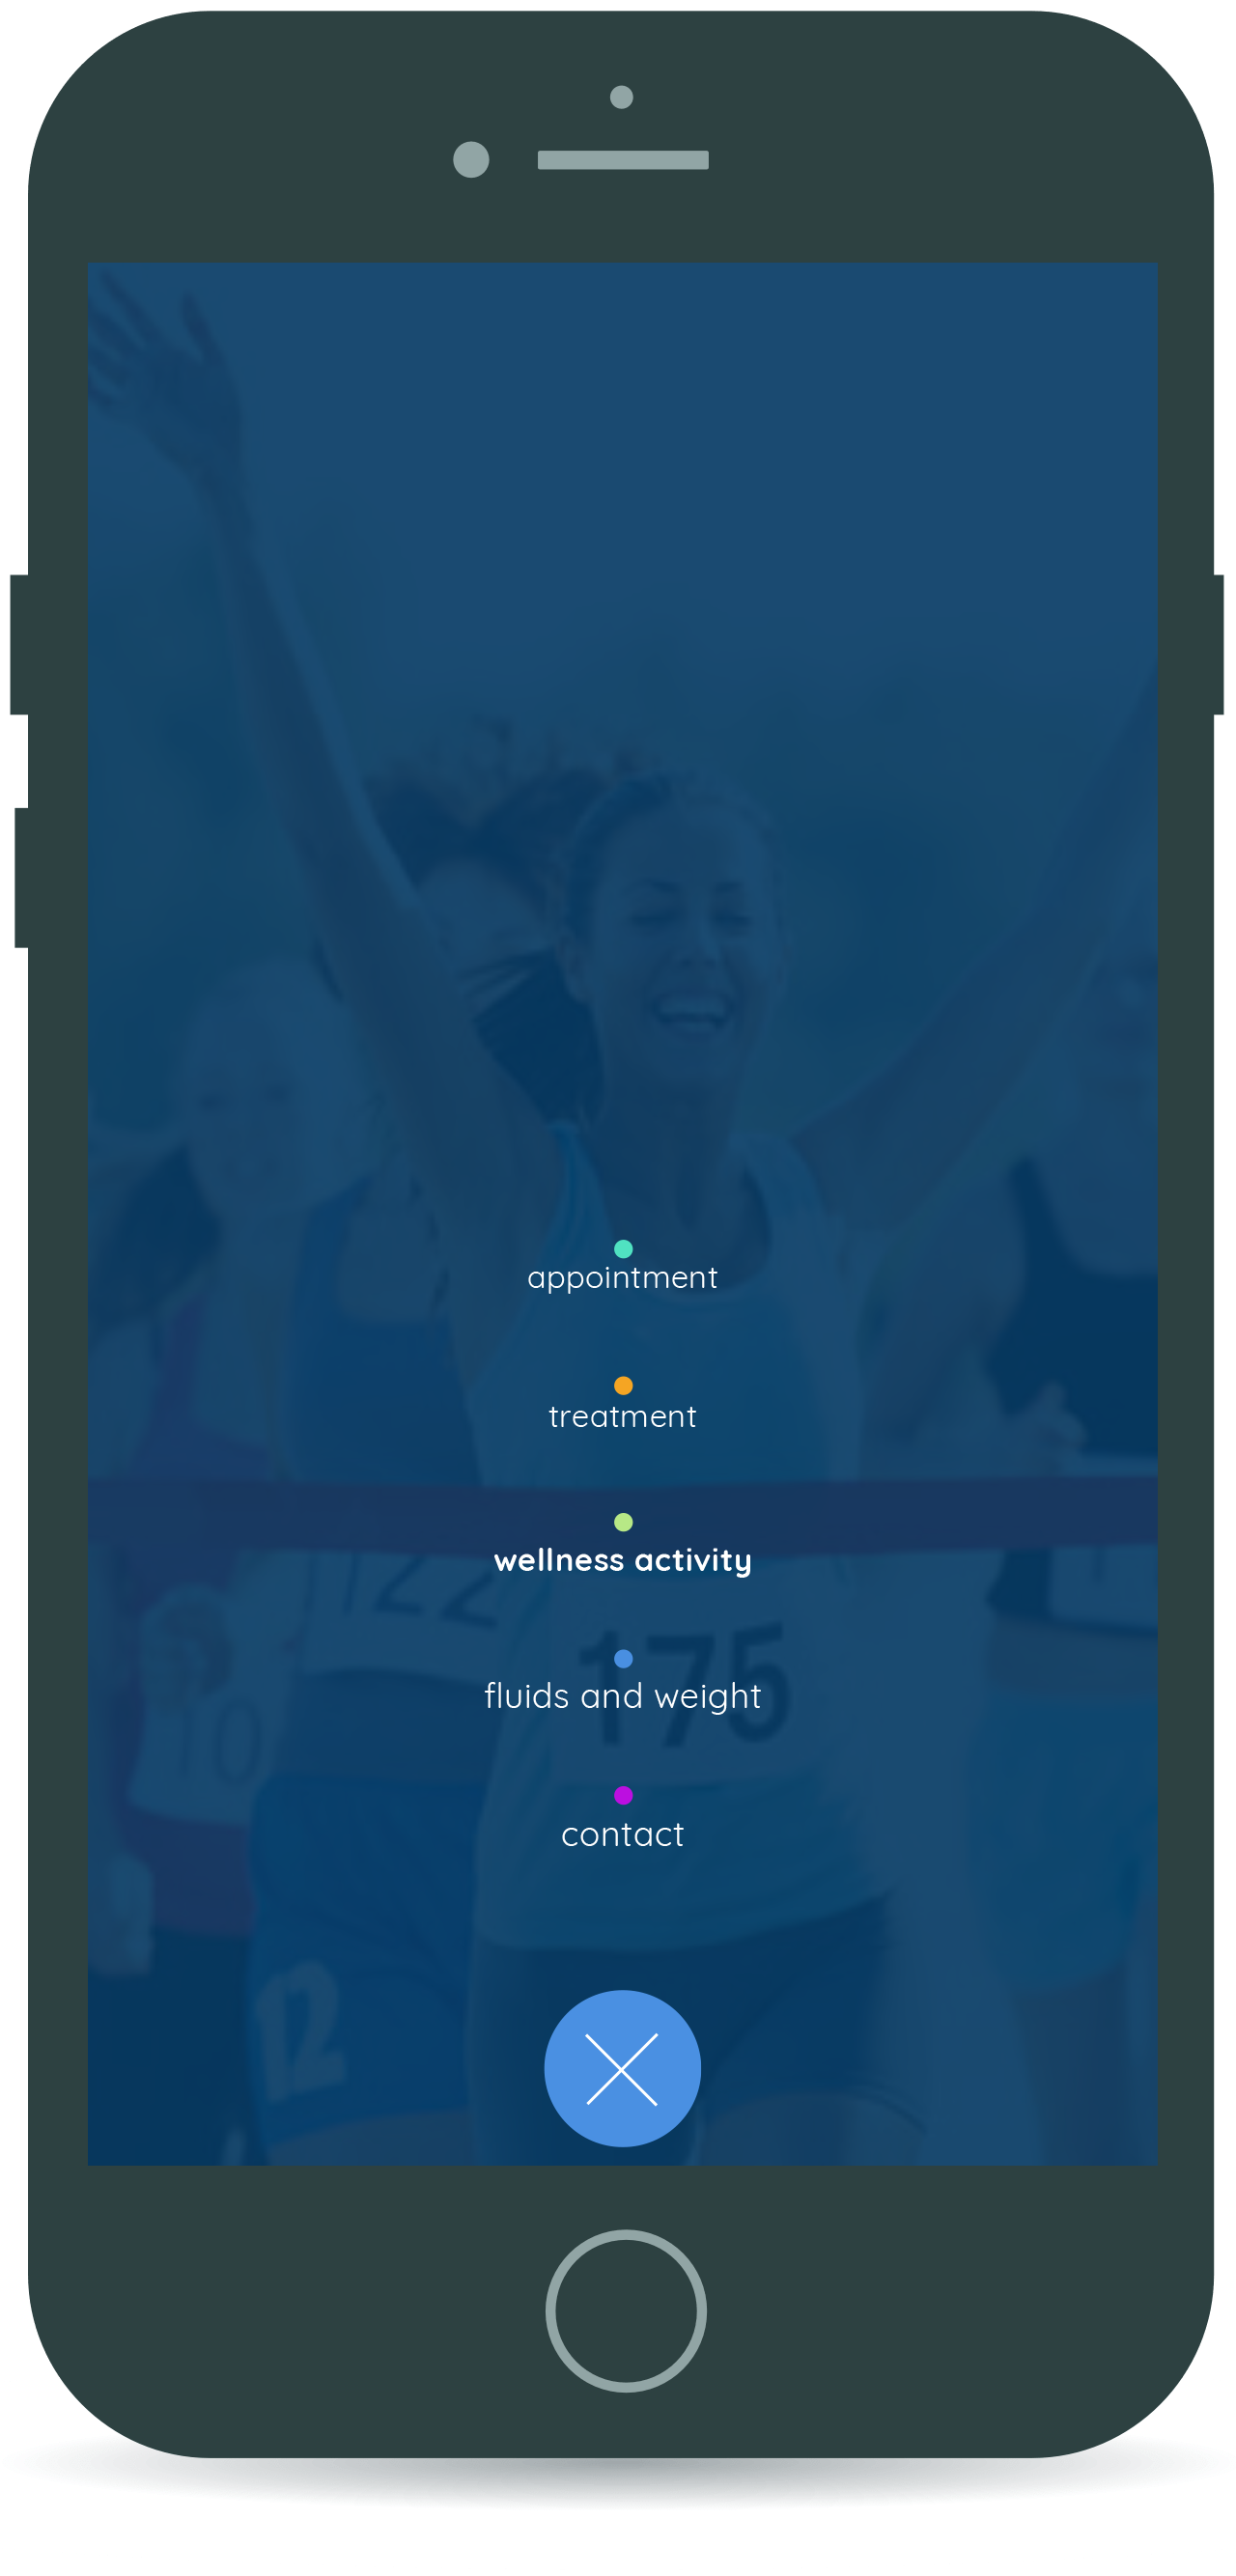 disease-app_features 1